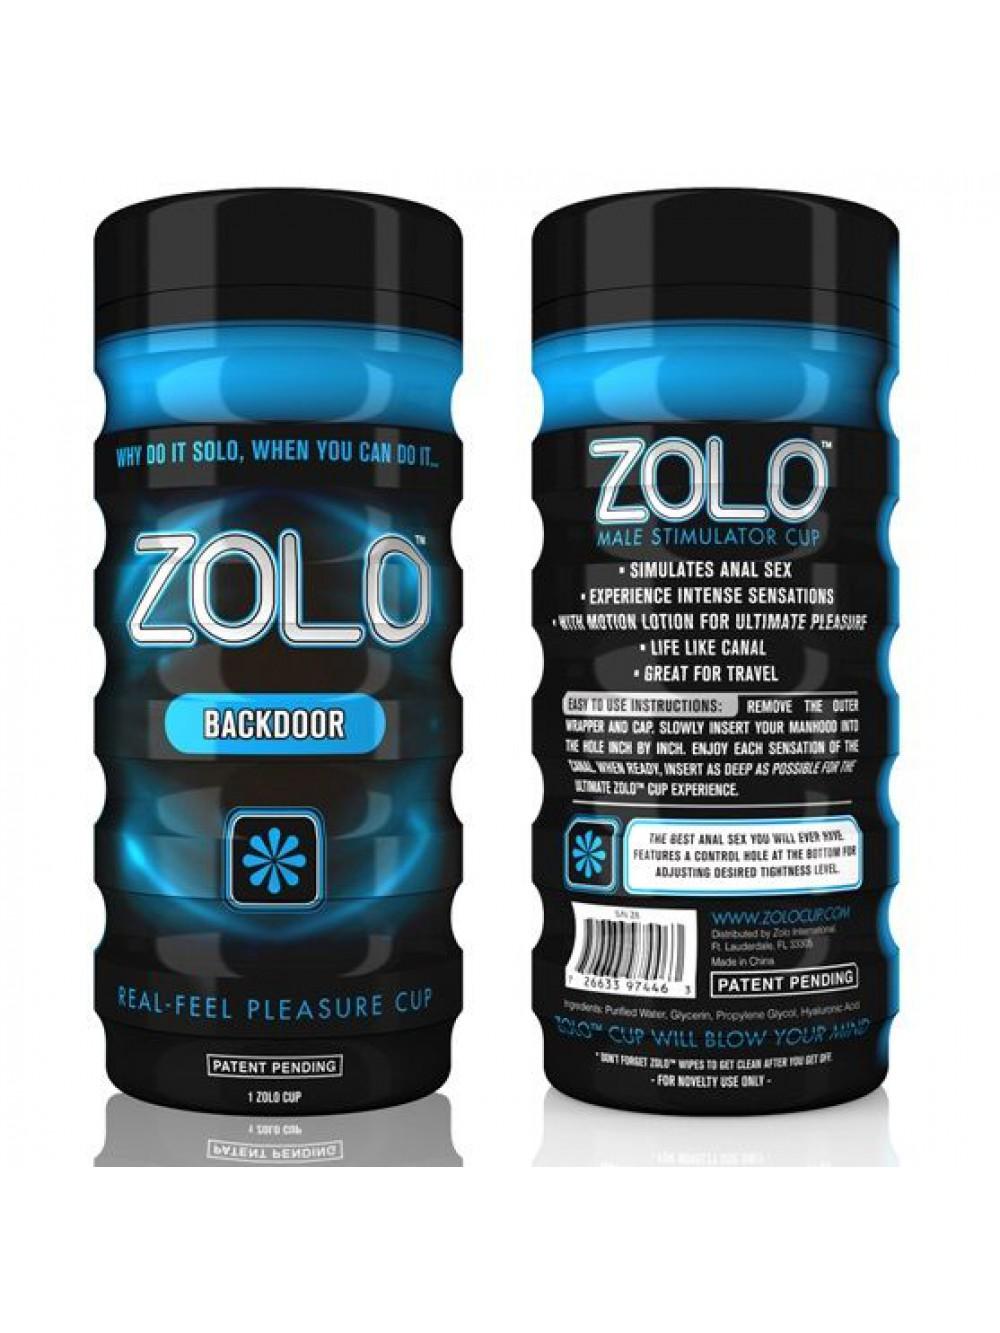 Zolo Back Door Masturbatore Cup